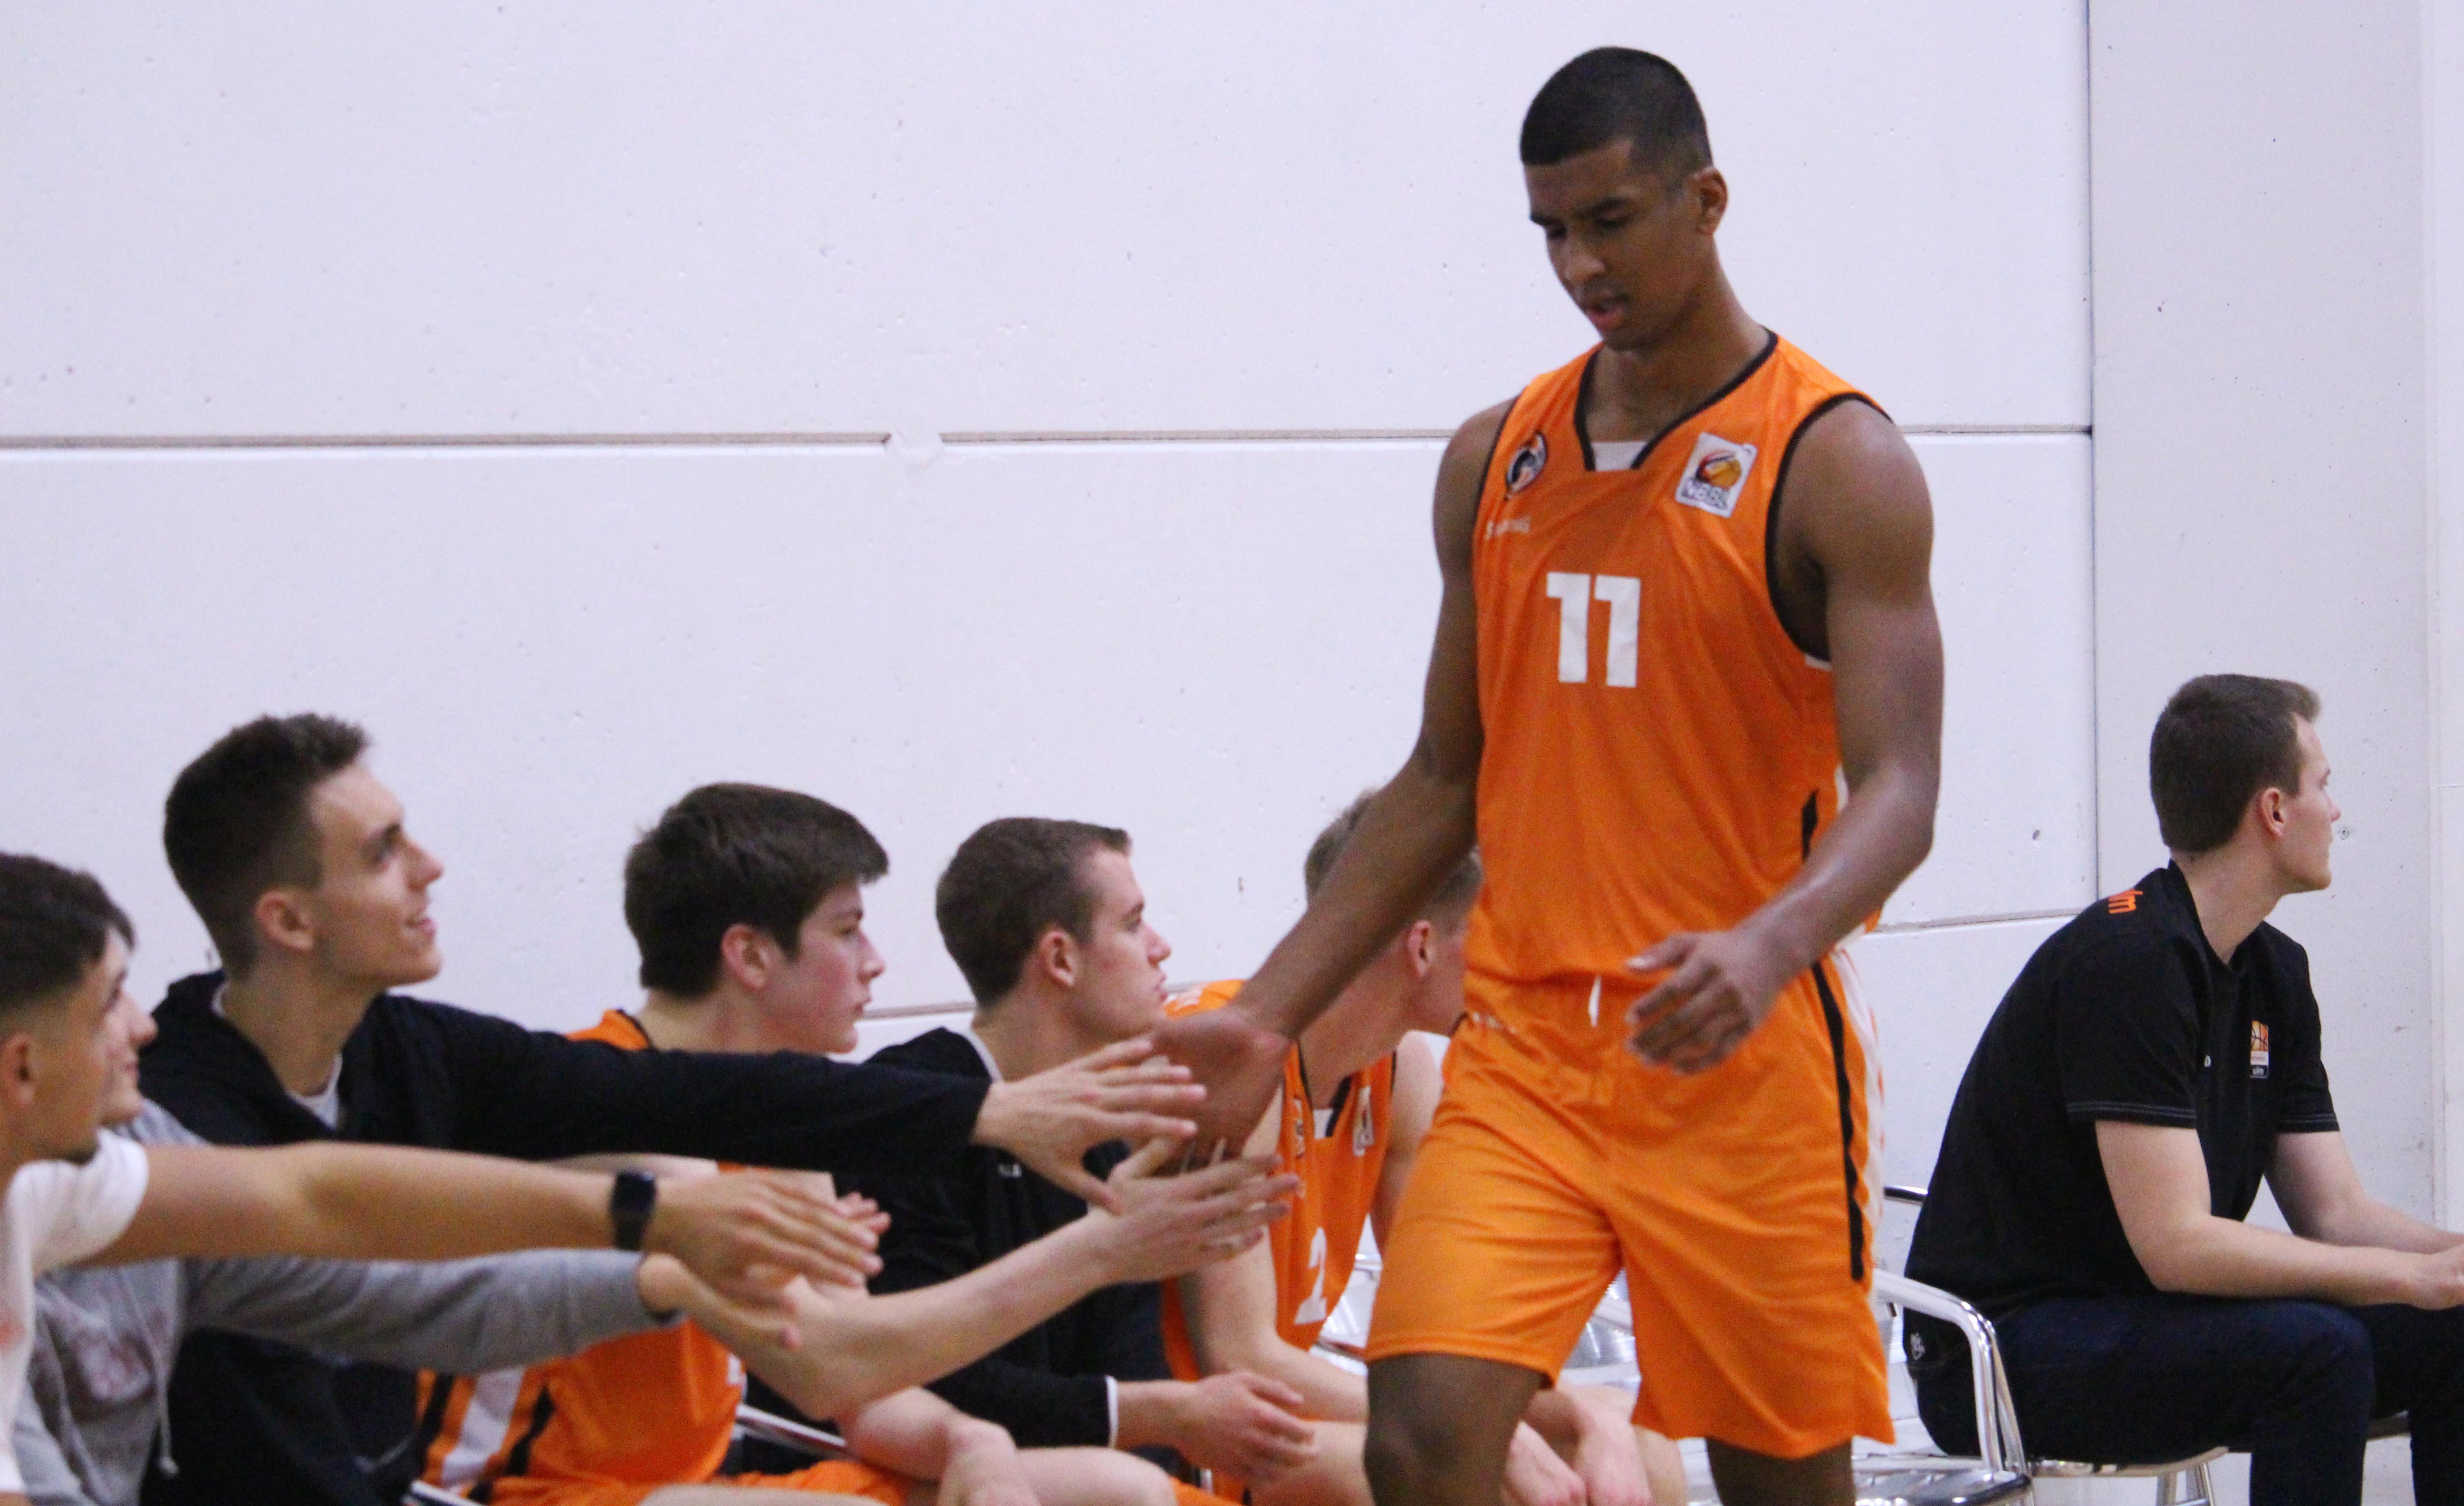 NBBL_19-20_OrangeAcademy_Young-Tigers-Tübingen_Spieltag3_Latrell-Großkopf